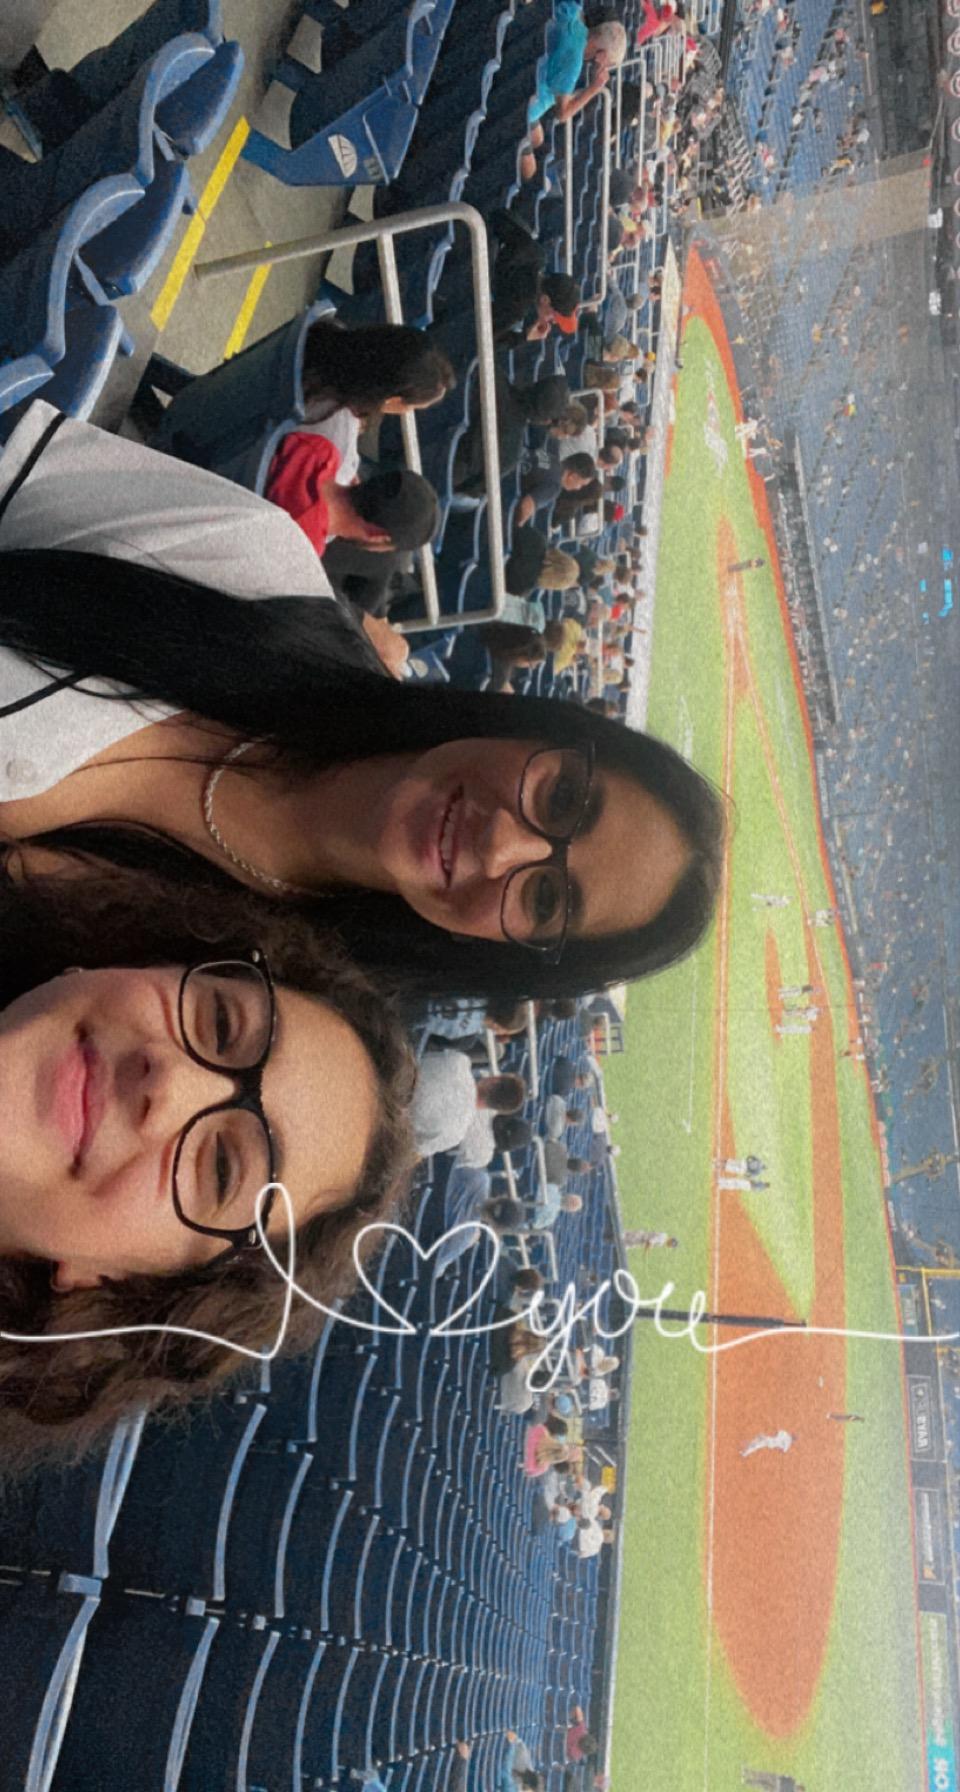 Tampa Bay v. Texas Rangers 4/15/2021